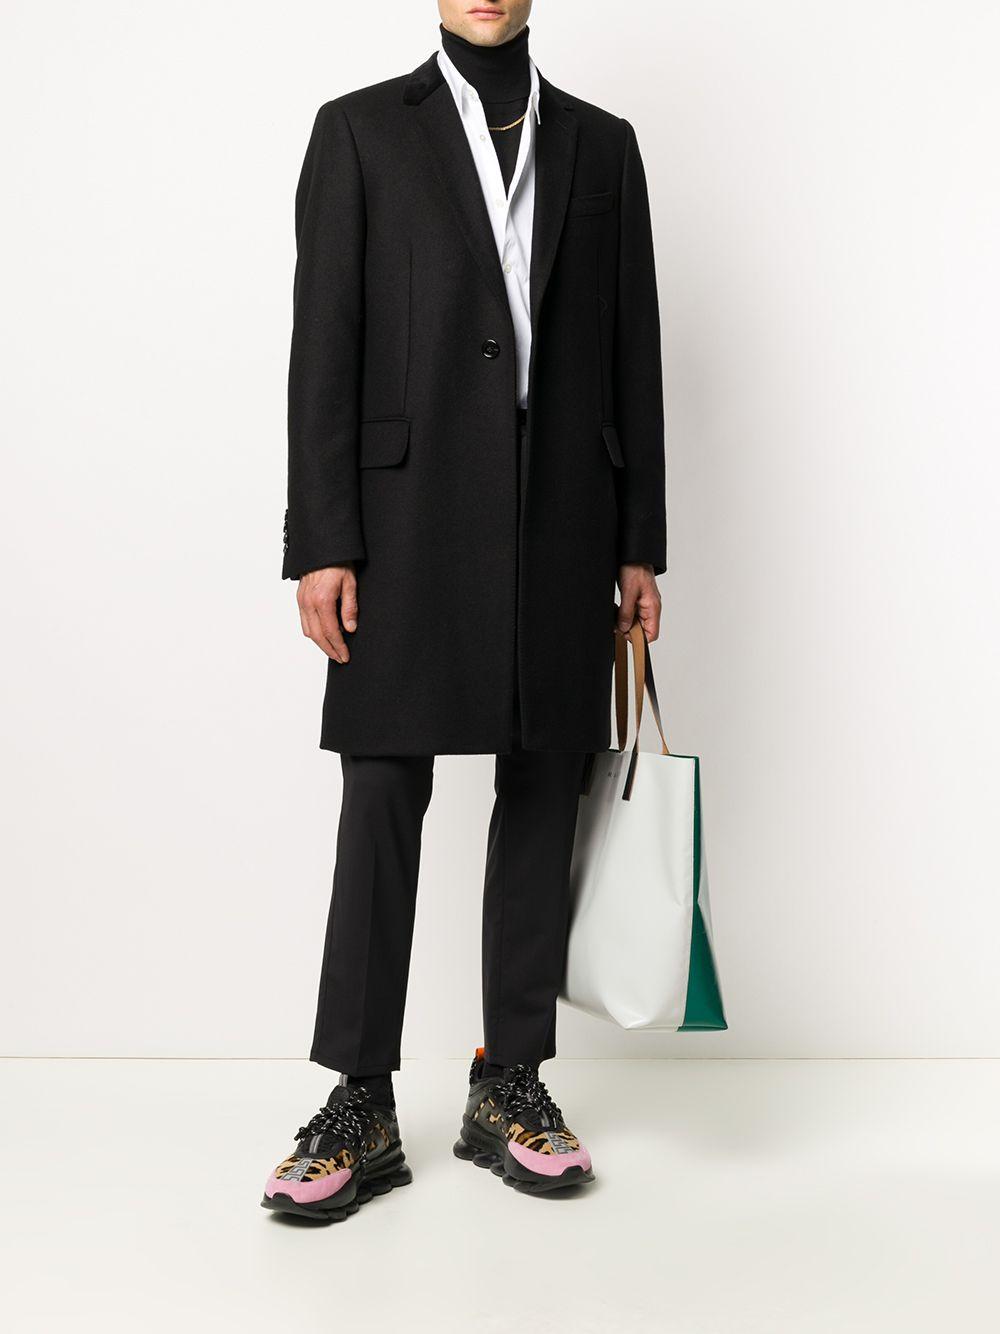 pantalone sartoriale in lana vergine nera DOLCE & GABBANA | Pantaloni | GW08AT-FUBECN0000